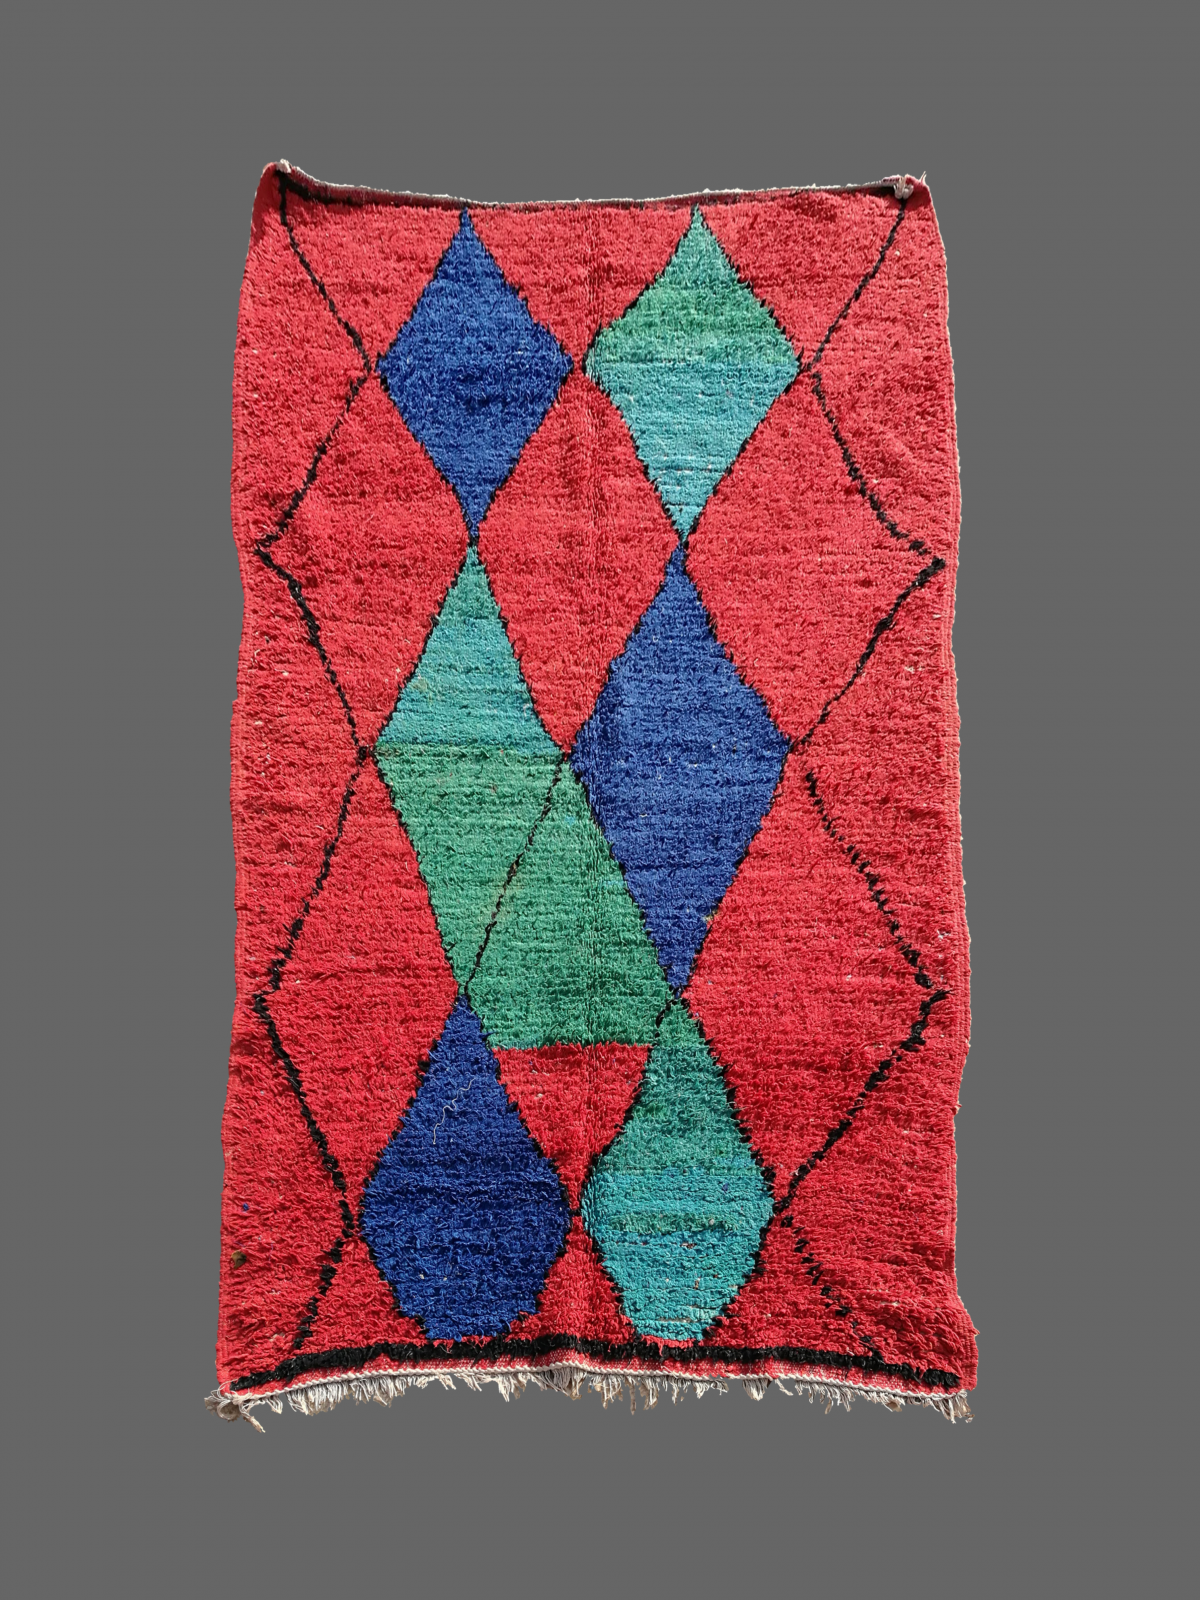 tapis azilal losange rouge